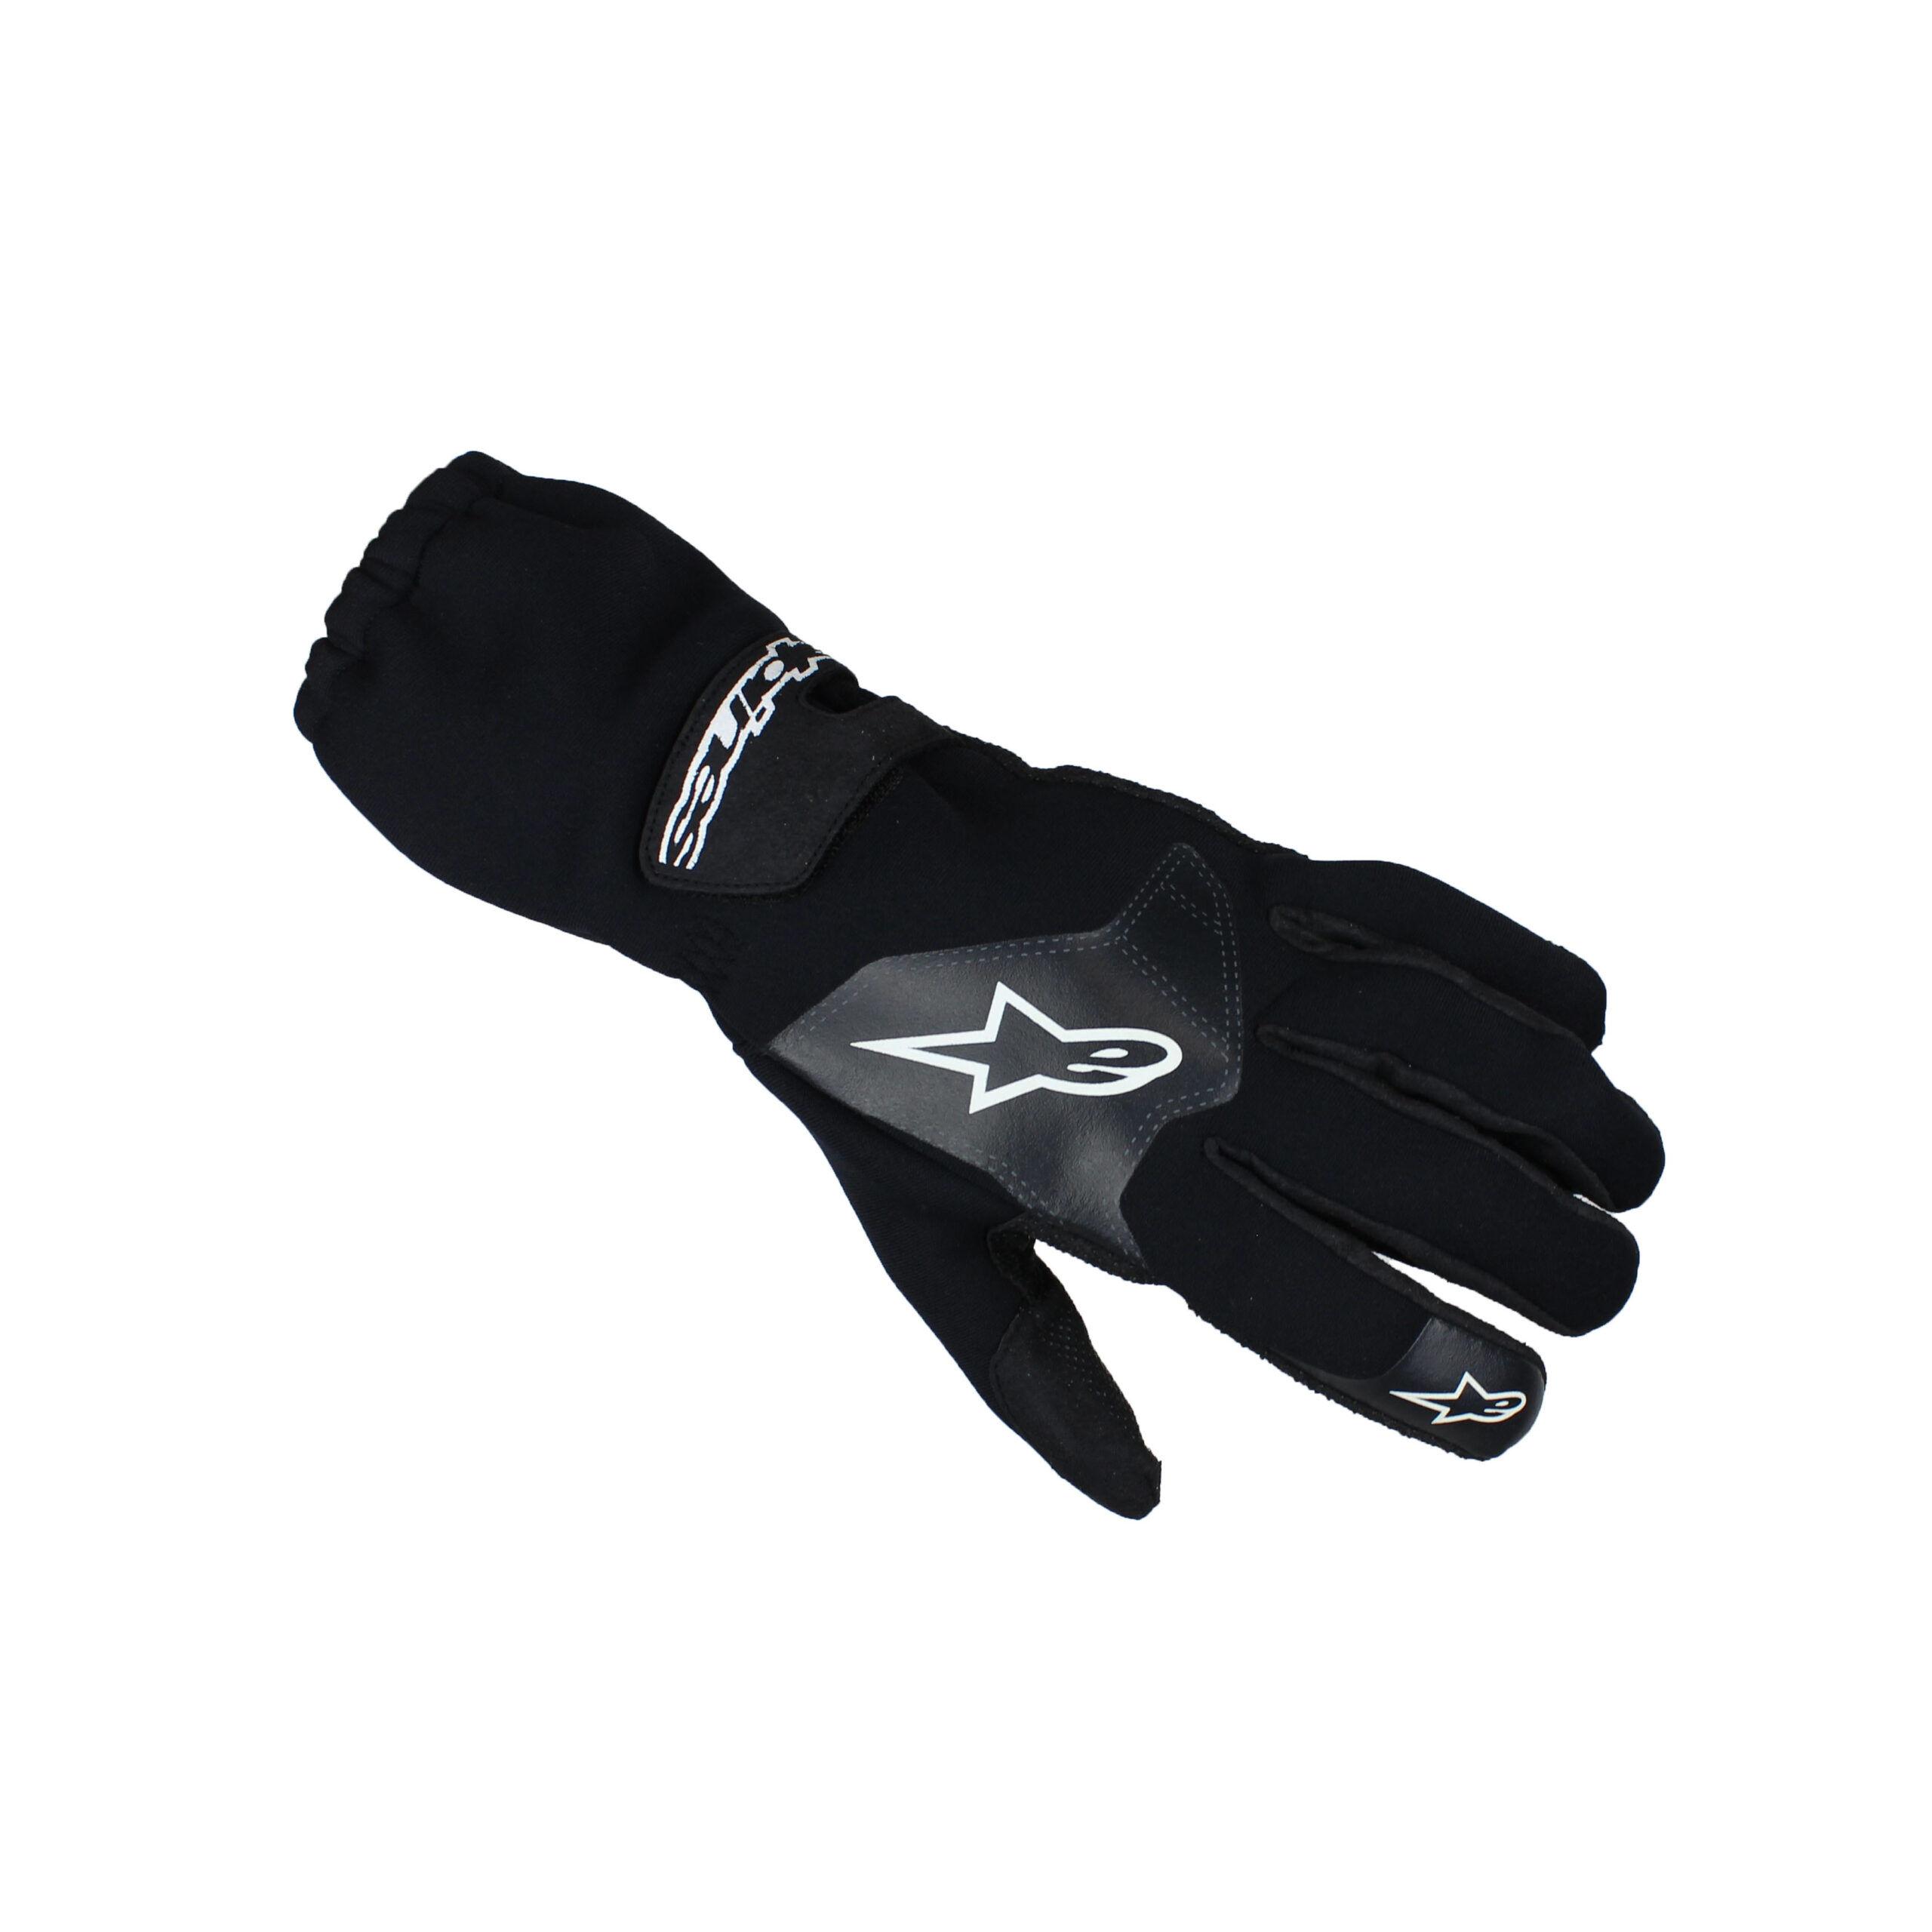 Alpinestars Neo Pro Karting Gloves Black